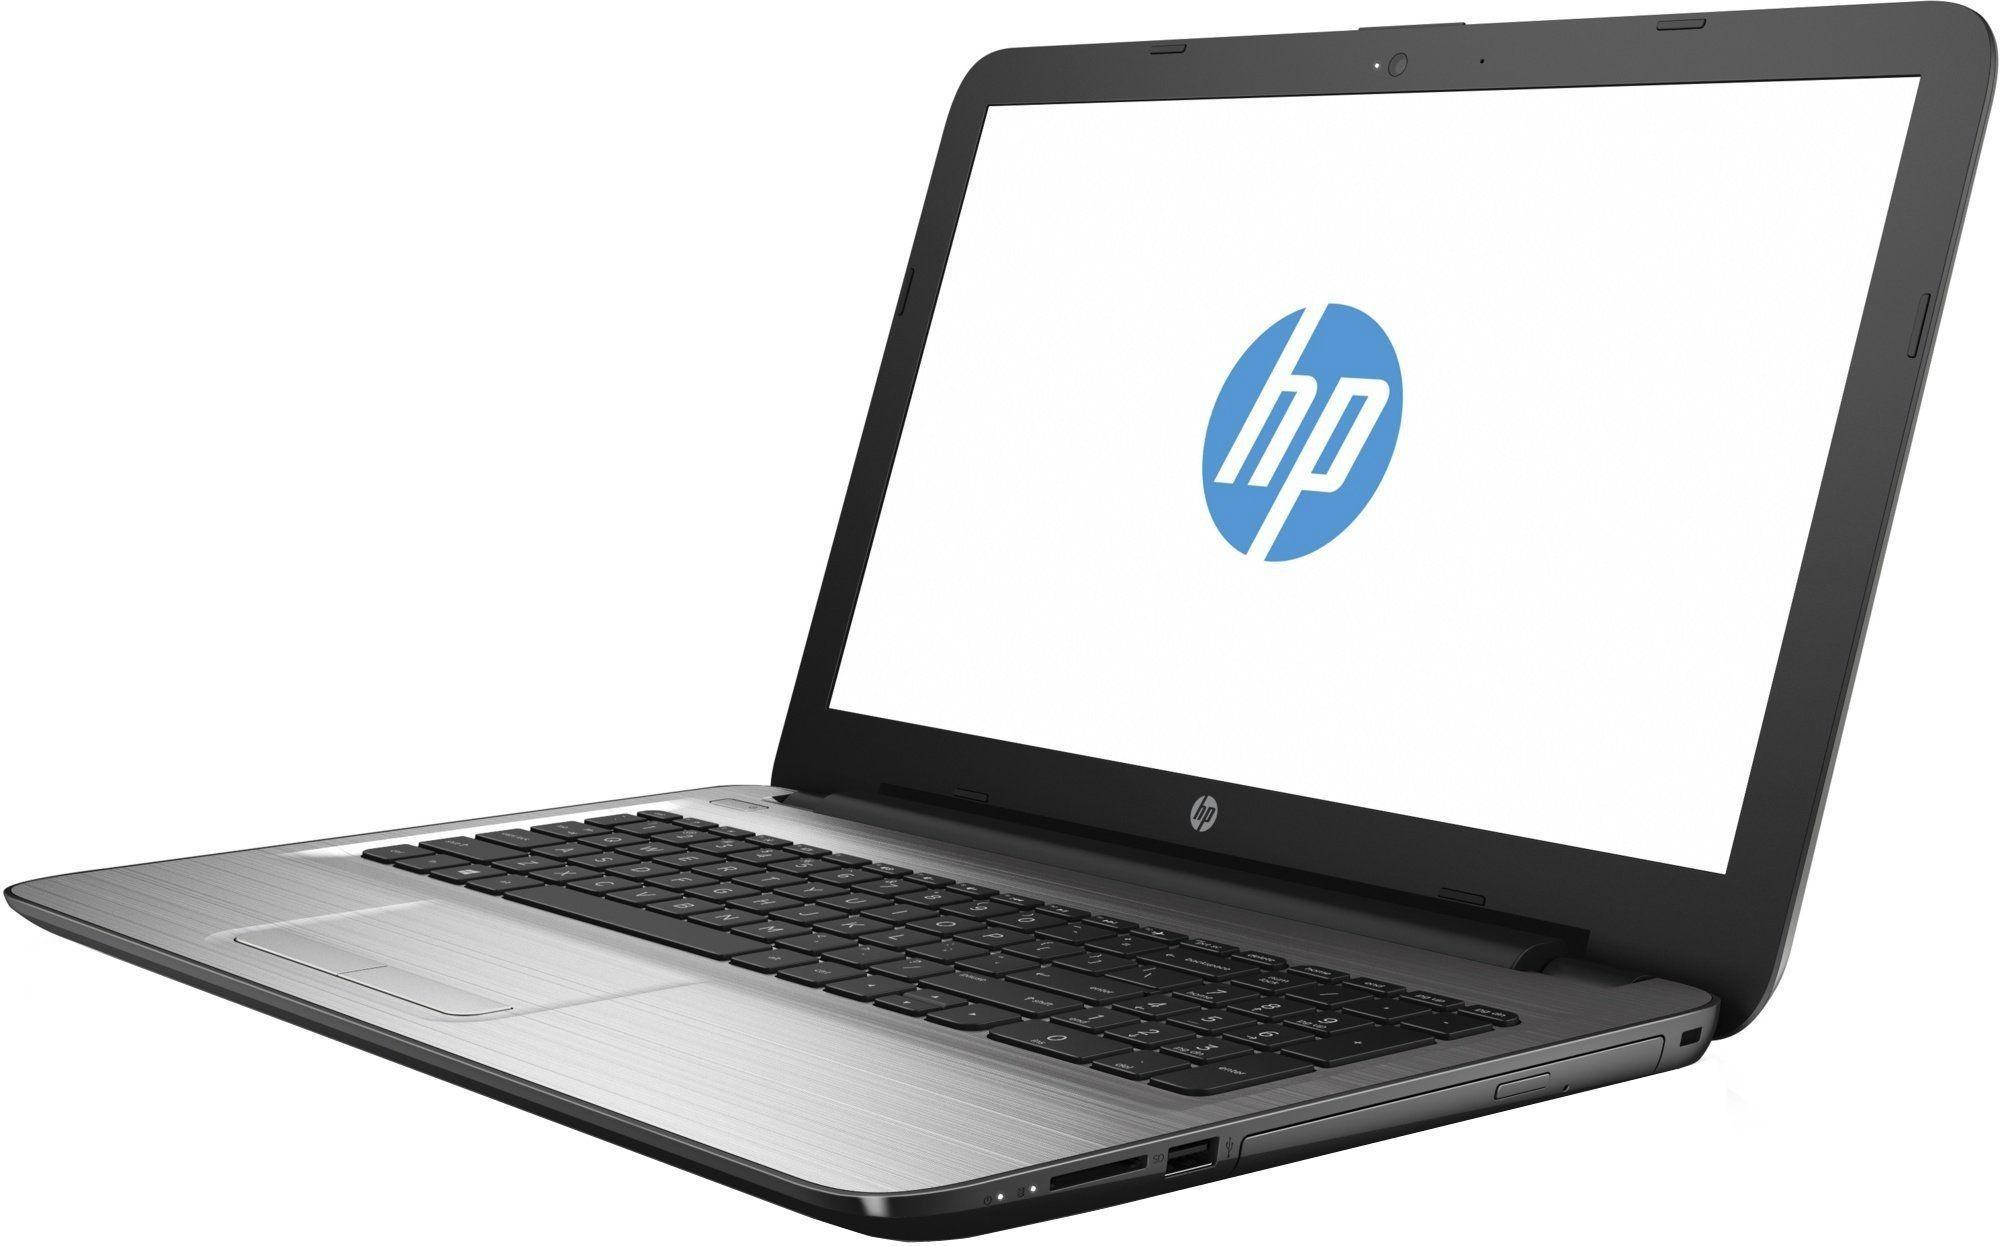 Купить Ноутбук HP Pavilion 15-cc504ur (1ZA96EA) фото 2